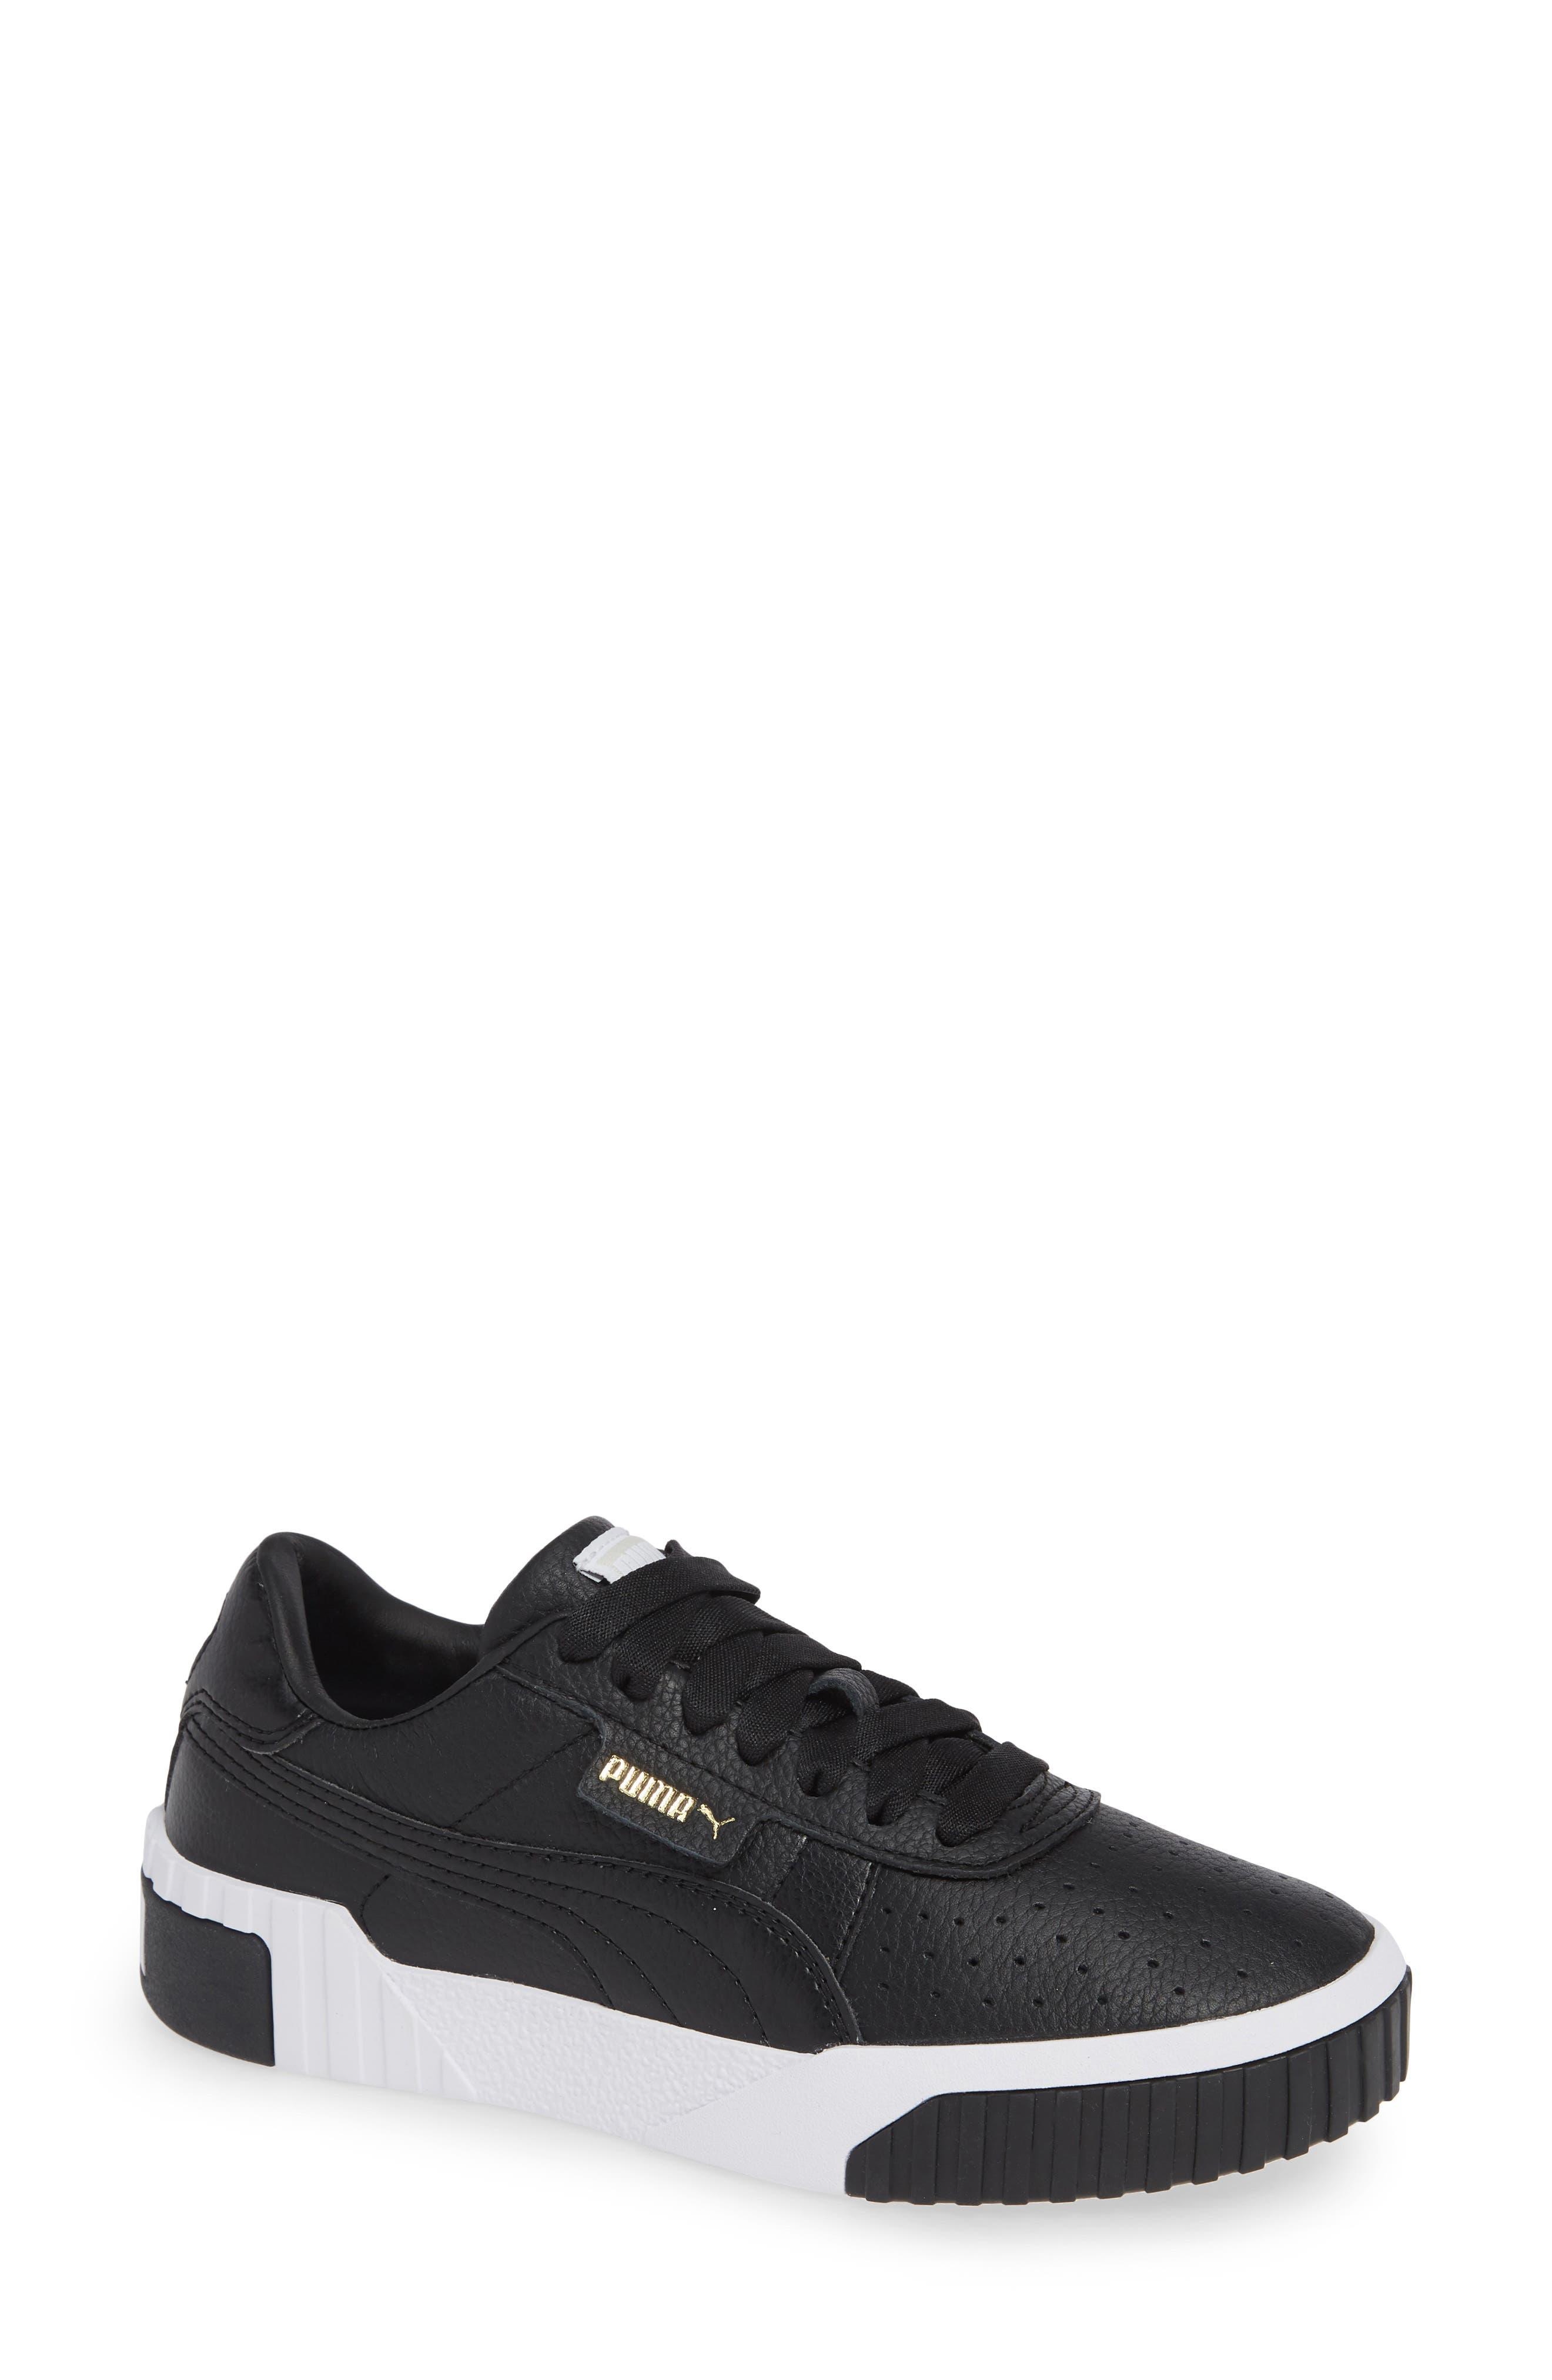 fc37ff0553b9cb PUMA Women s Shoes